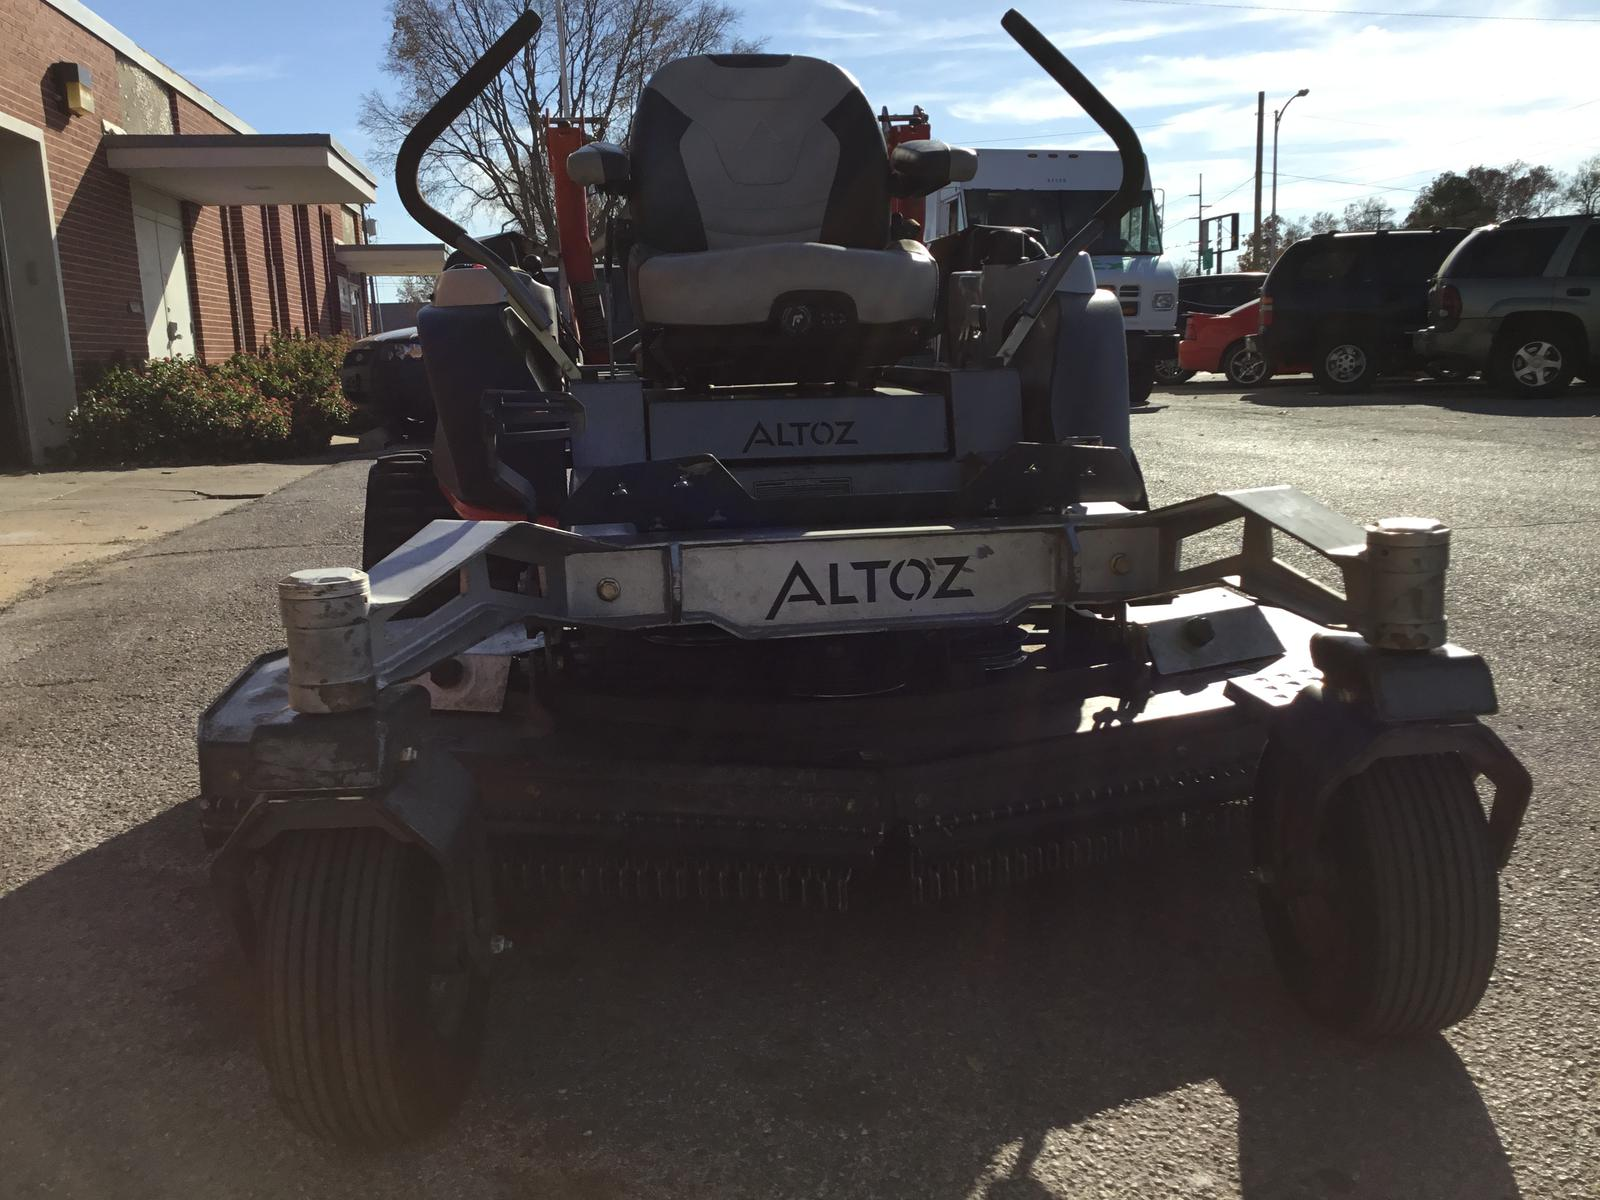 2017 Altoz TRX 660 i Vanguard for sale in Tulsa, OK. Maverick ...